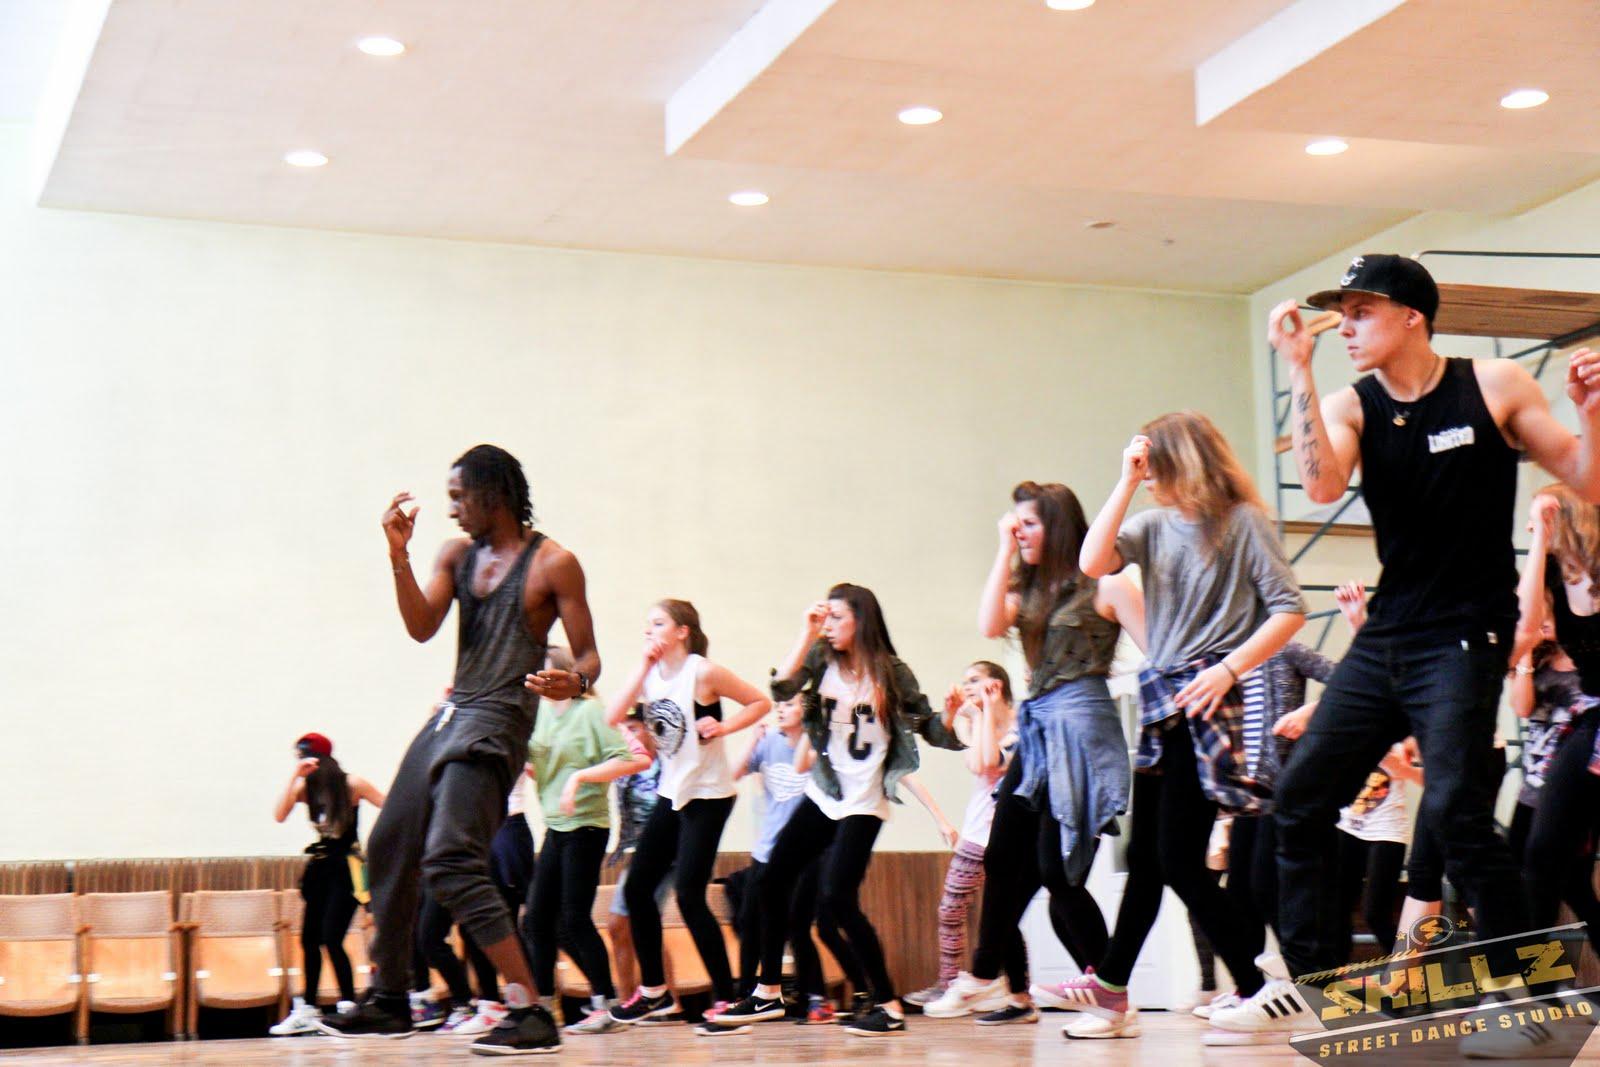 Dancehall workshop with Camron One Shot - IMG_7781.jpg